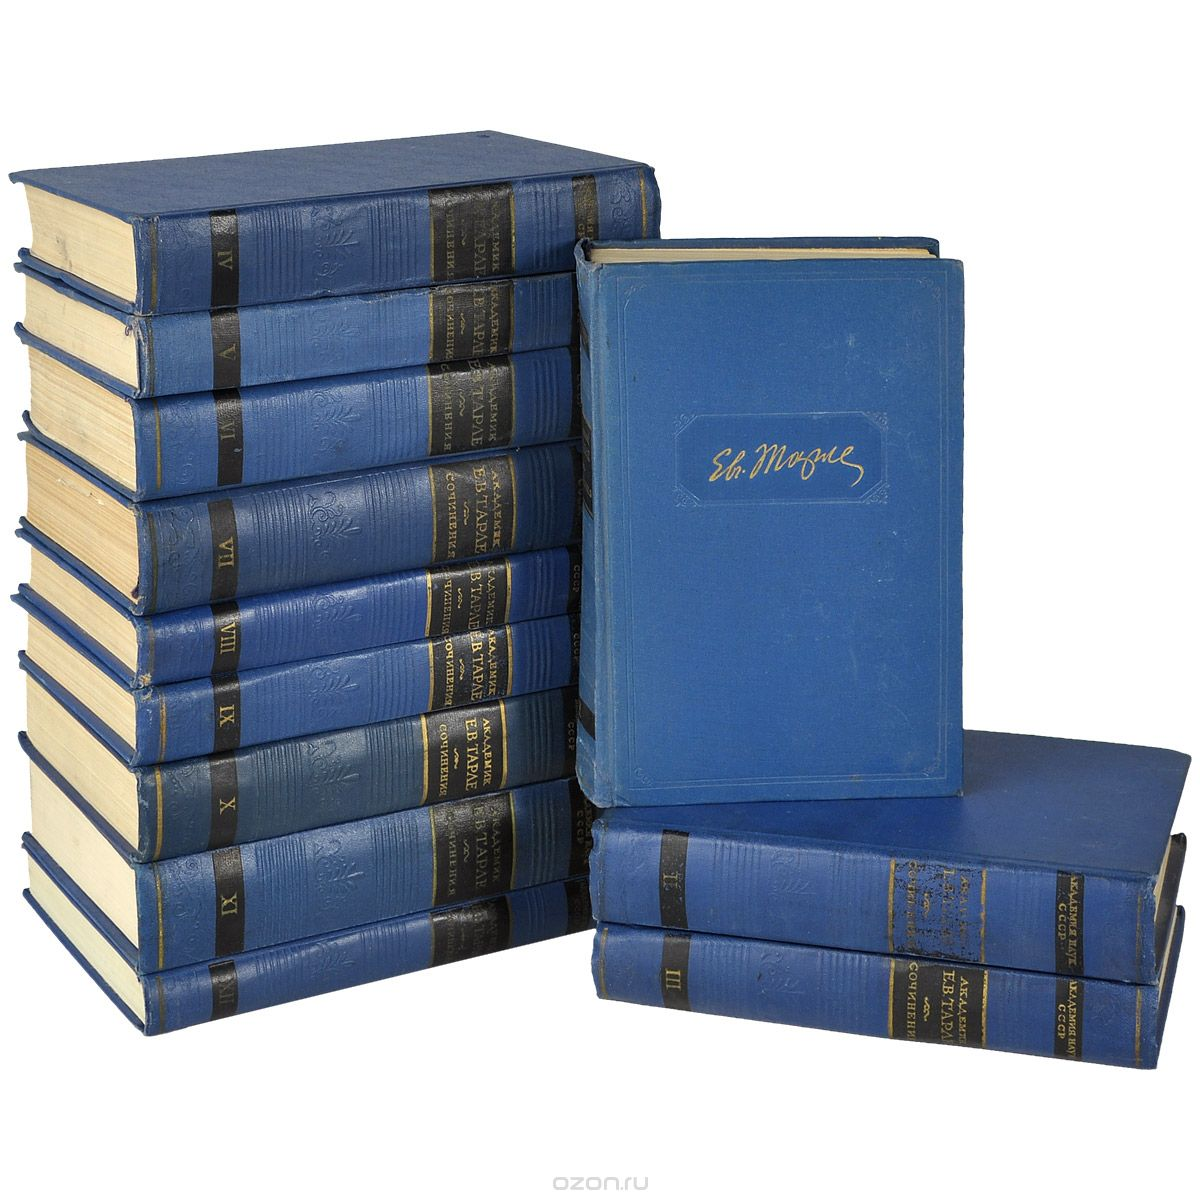 Собрание сочинений Е.В. Тарле 1957 года